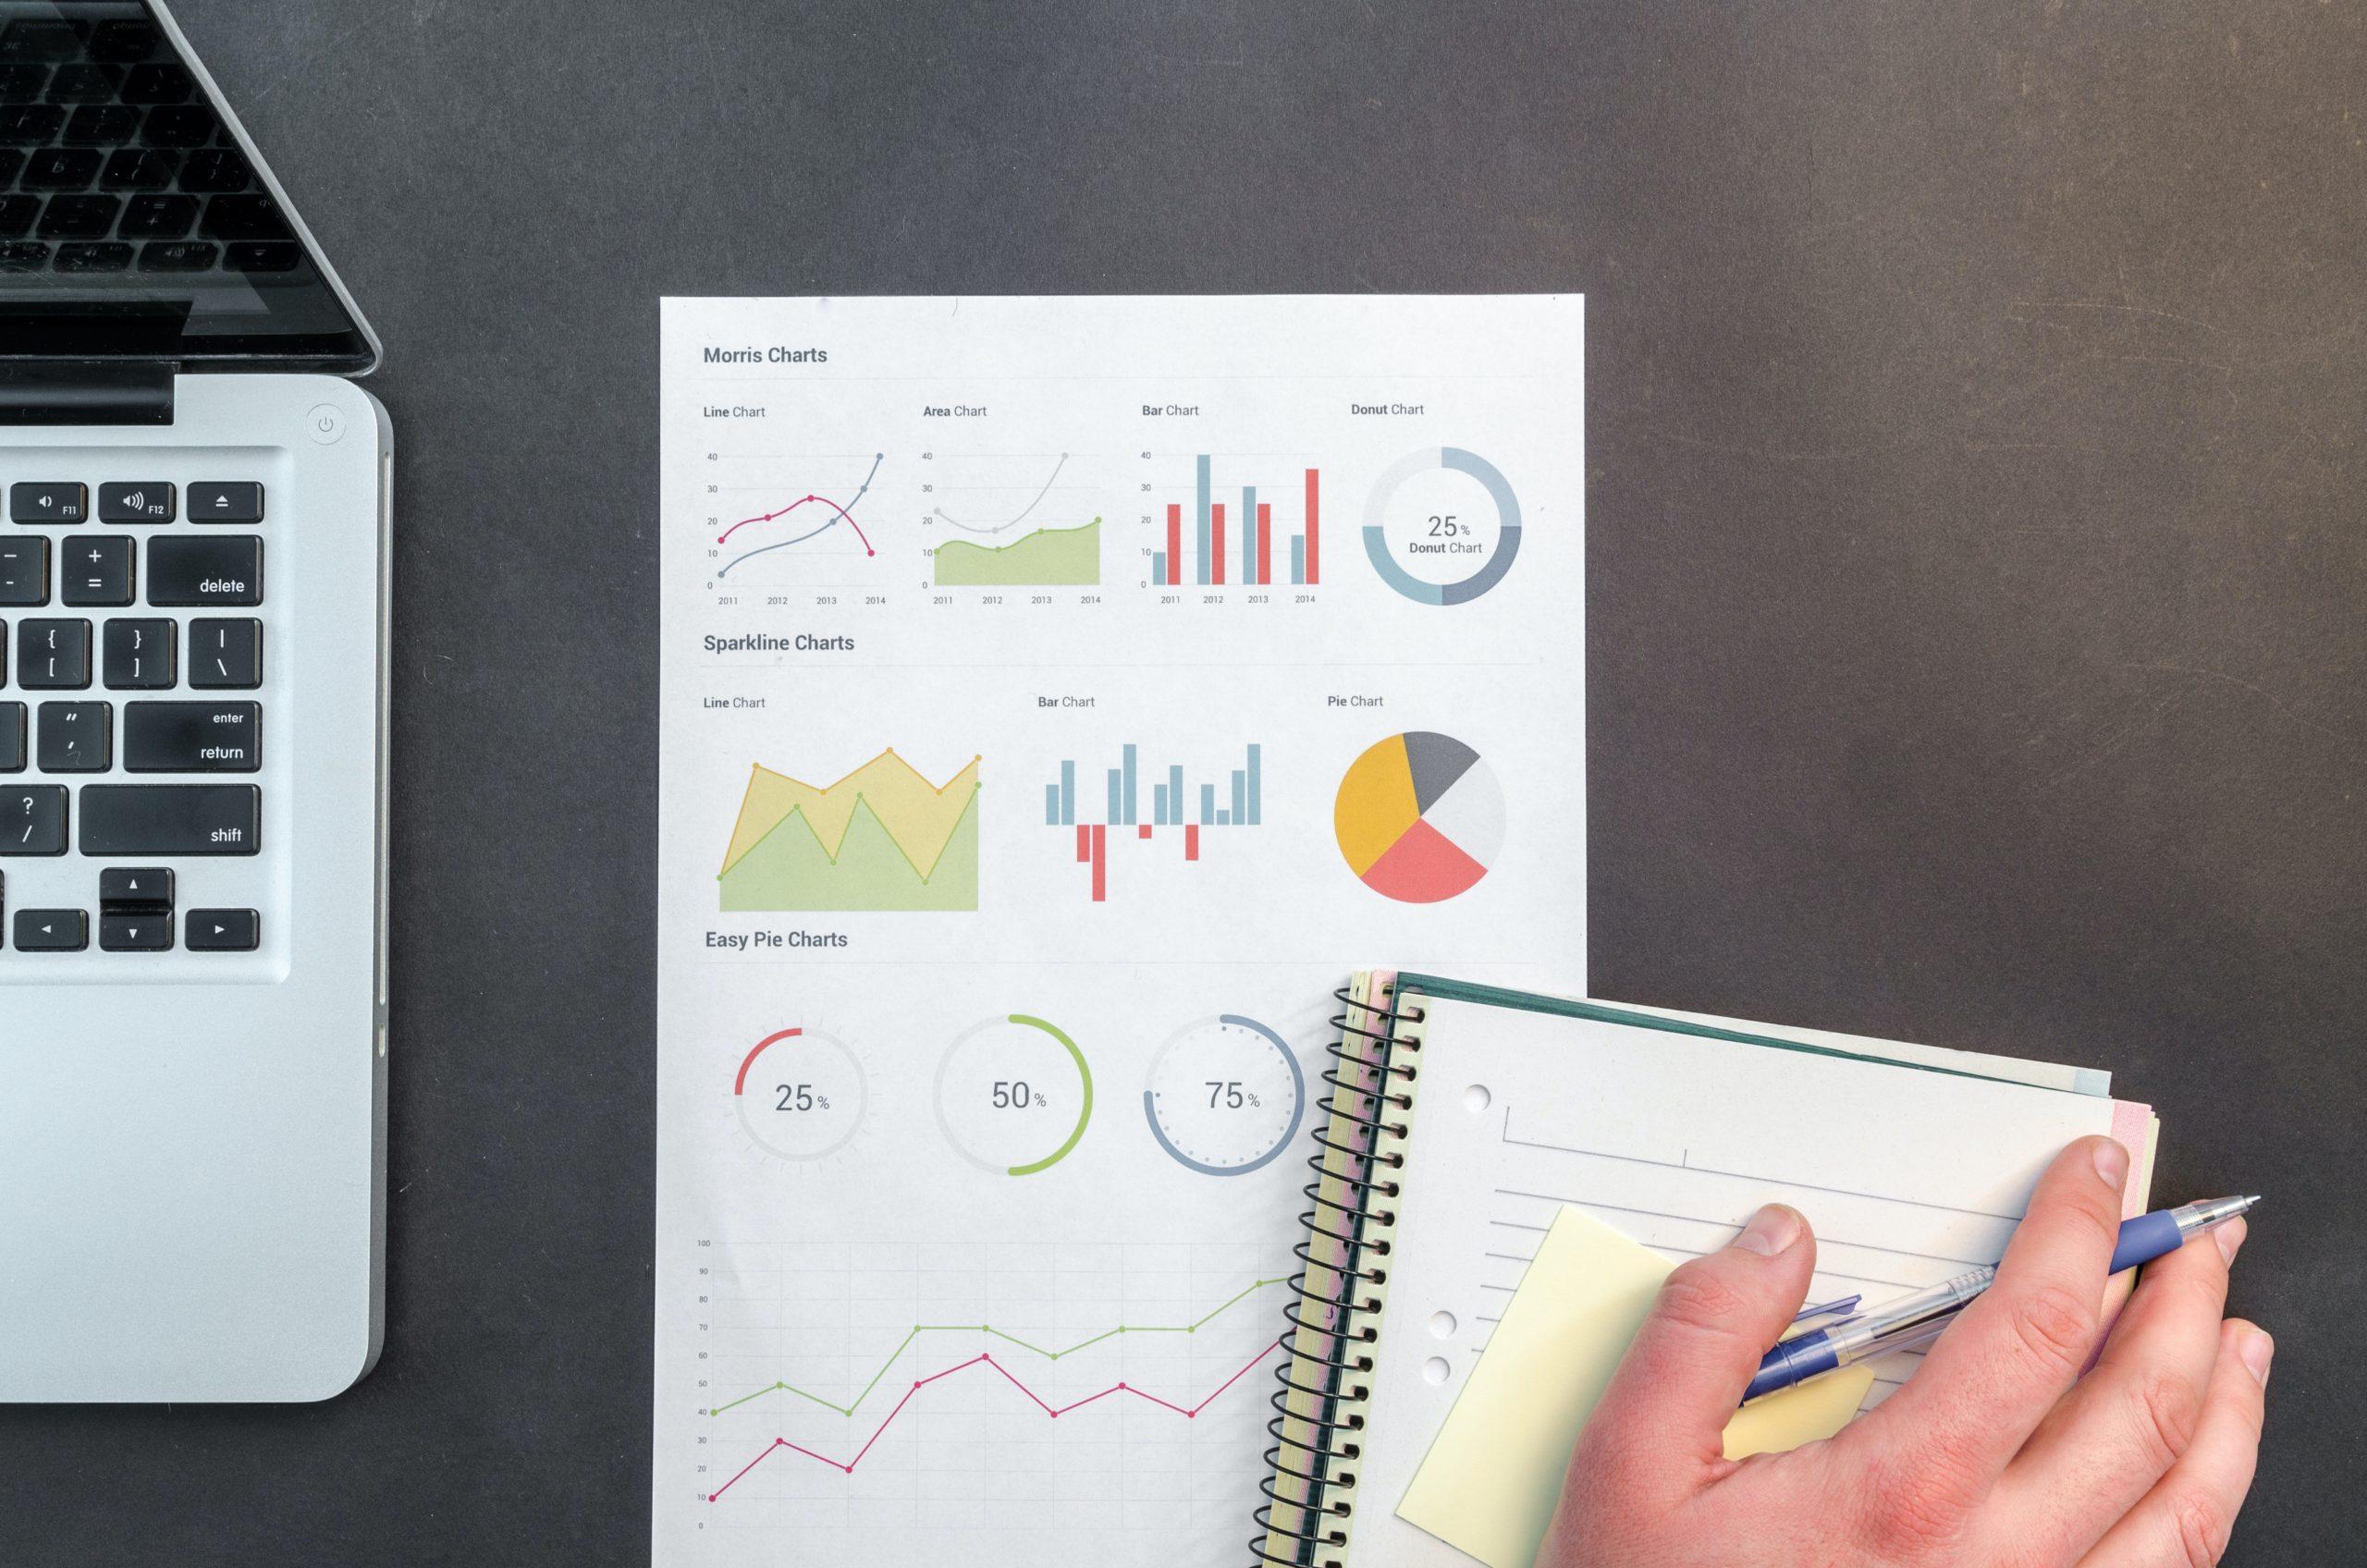 4 best email marketing strategies